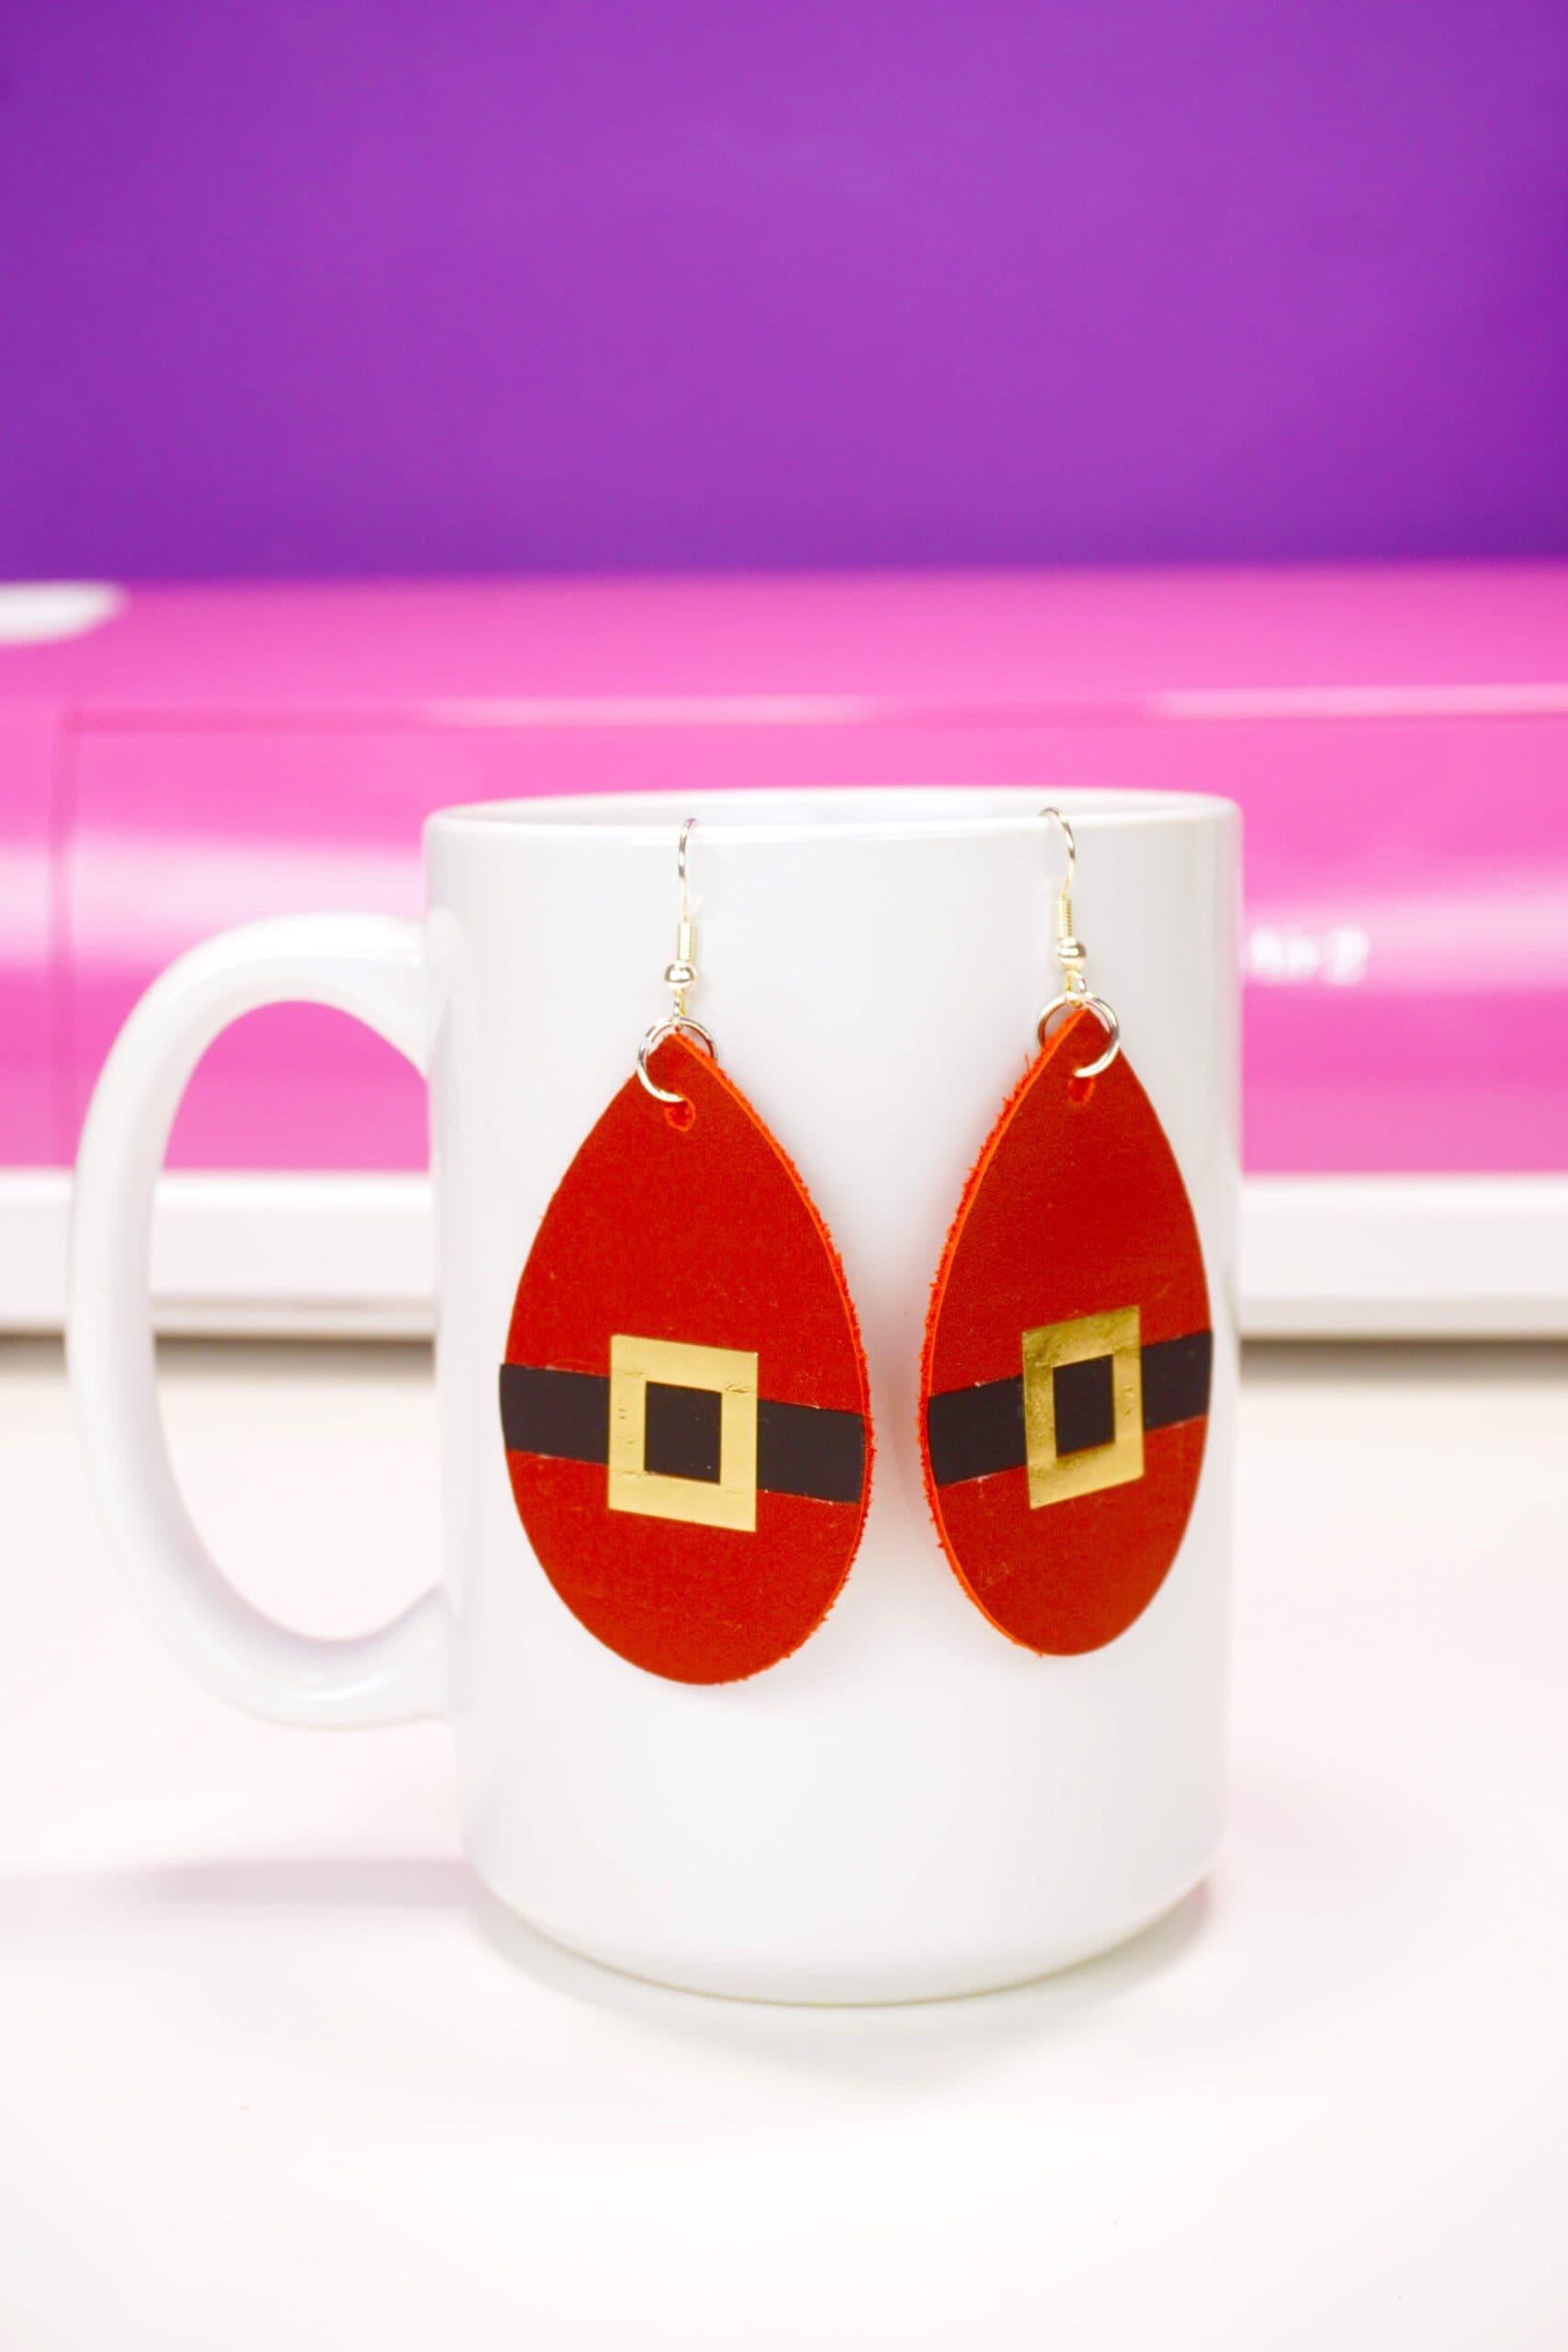 santa suit earrings hanging on white mug